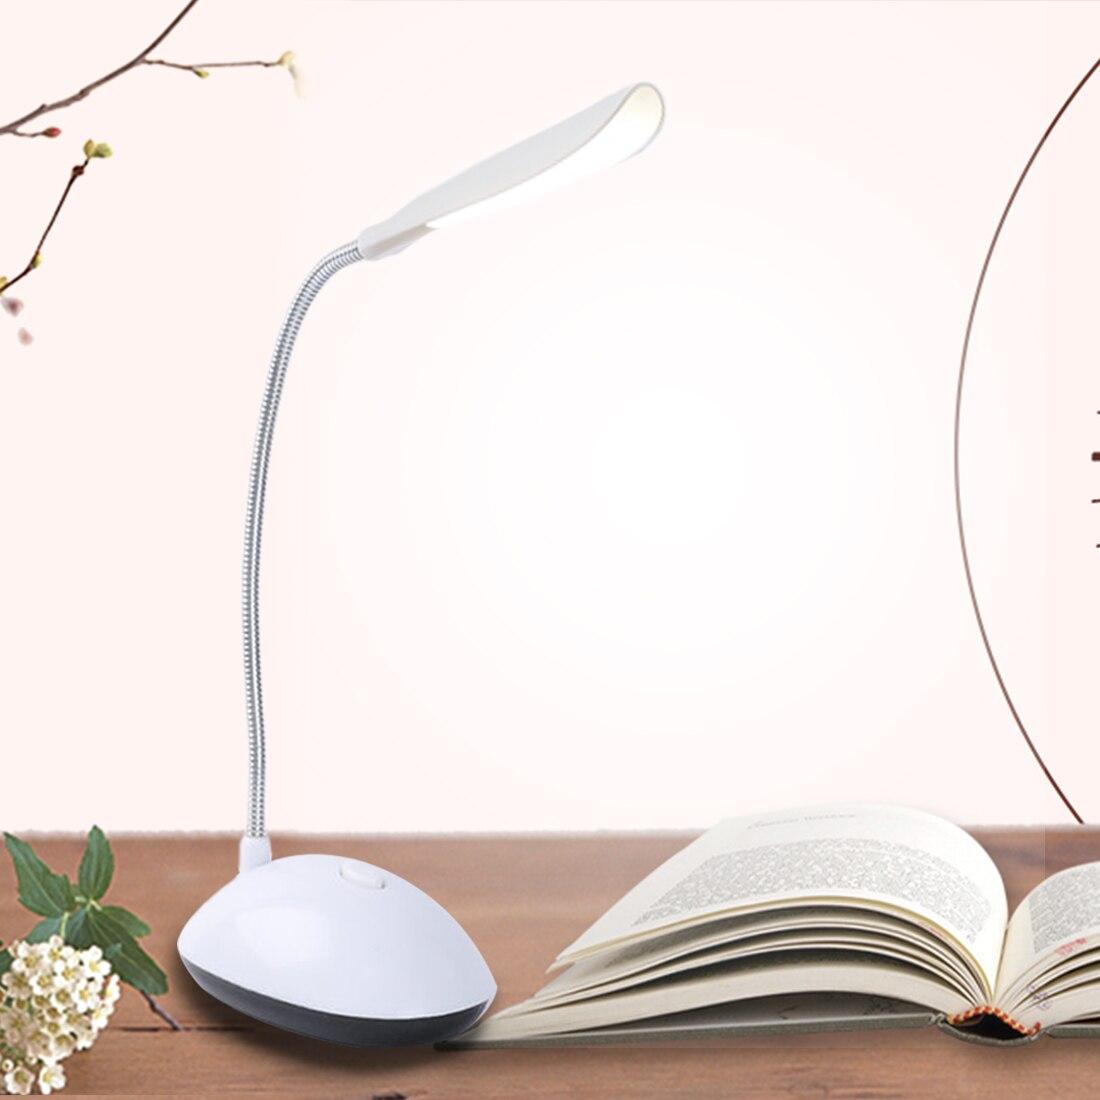 Portable 4 LED Reading Eye Protection LED Desk Lamp Power Mini Flexible Battery Powered LED Foldable Table Light Lamp For Study